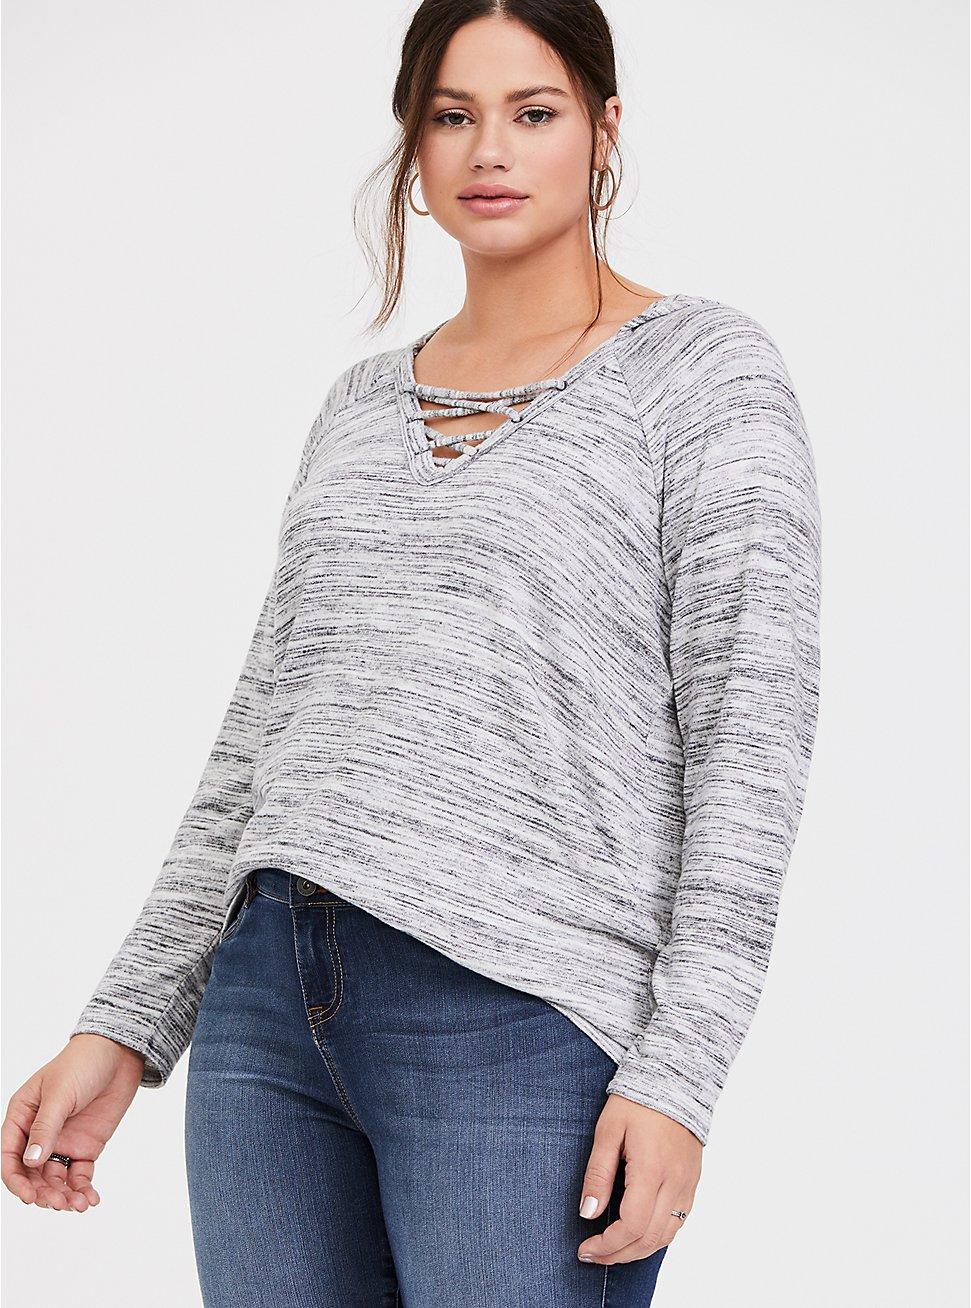 Super Soft Plush Light Grey Space-Dye Crisscross Hoodie, CHARCOAL HEATHER, hi-res